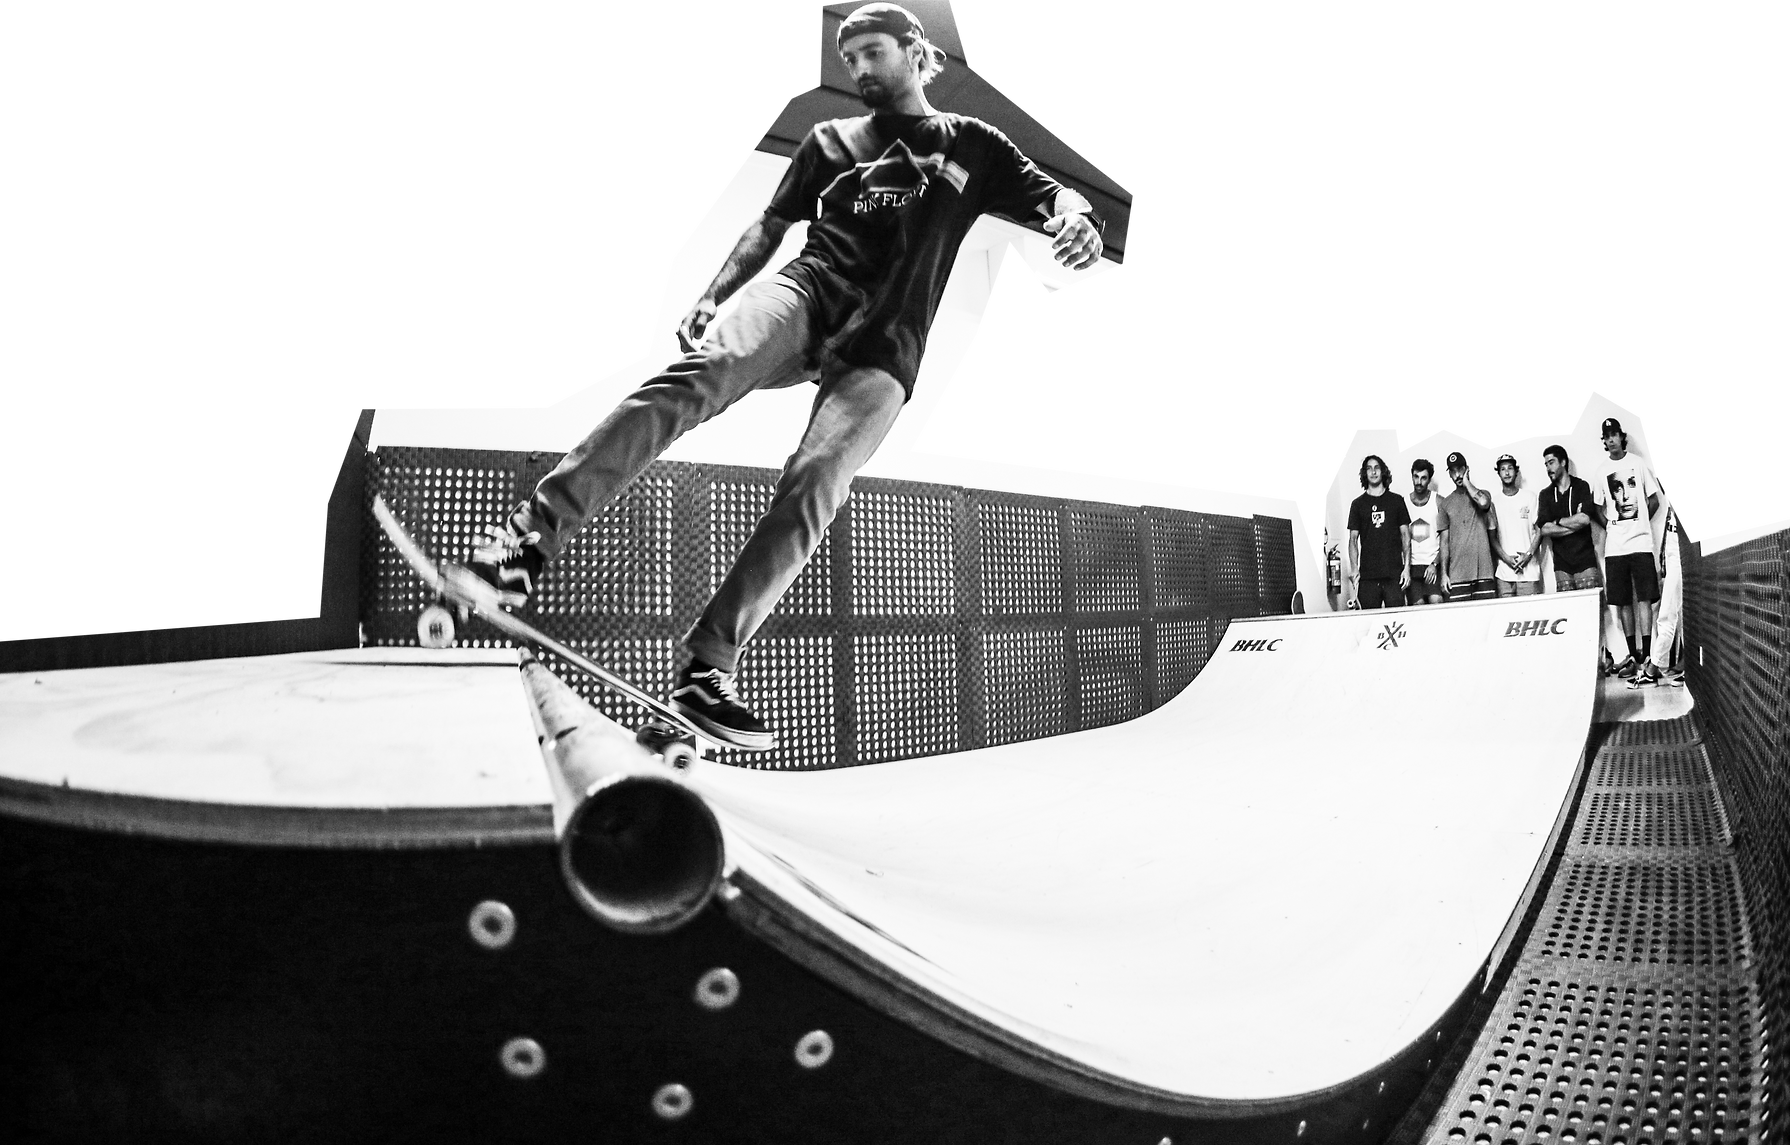 BHLC Skating mini ramp language school